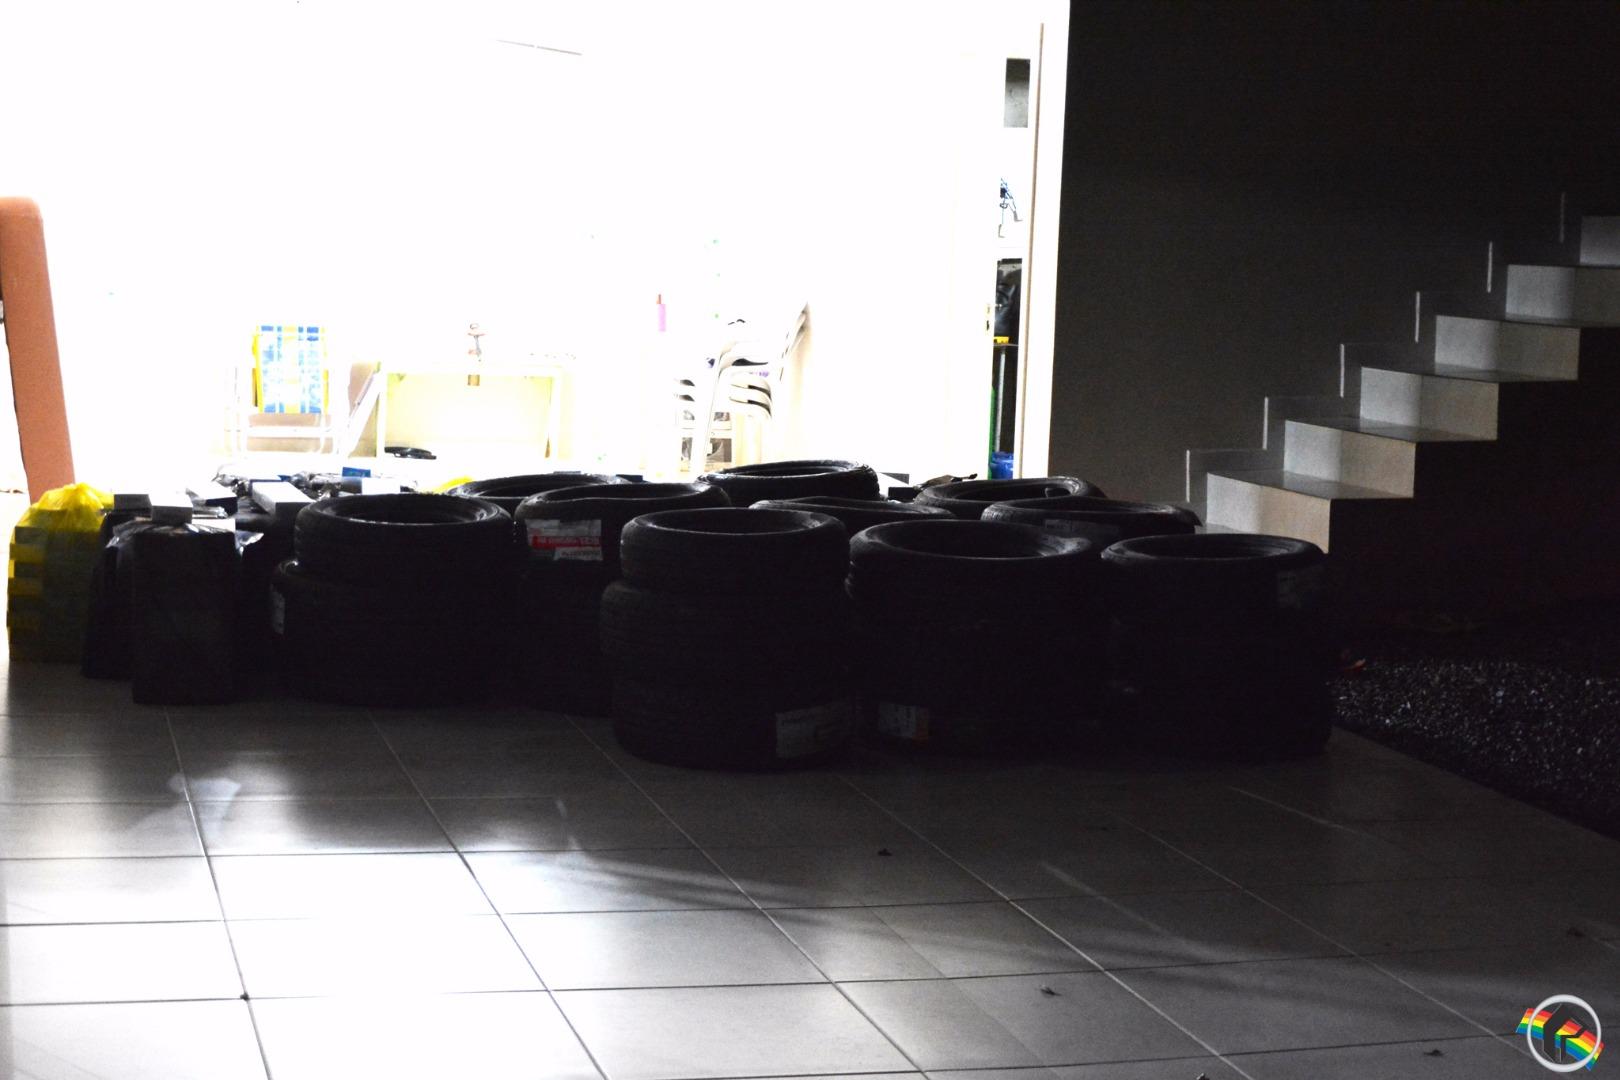 VÍDEO: Após denúncia, Polícia Militar apreende pneus e cigarros contrabandeados